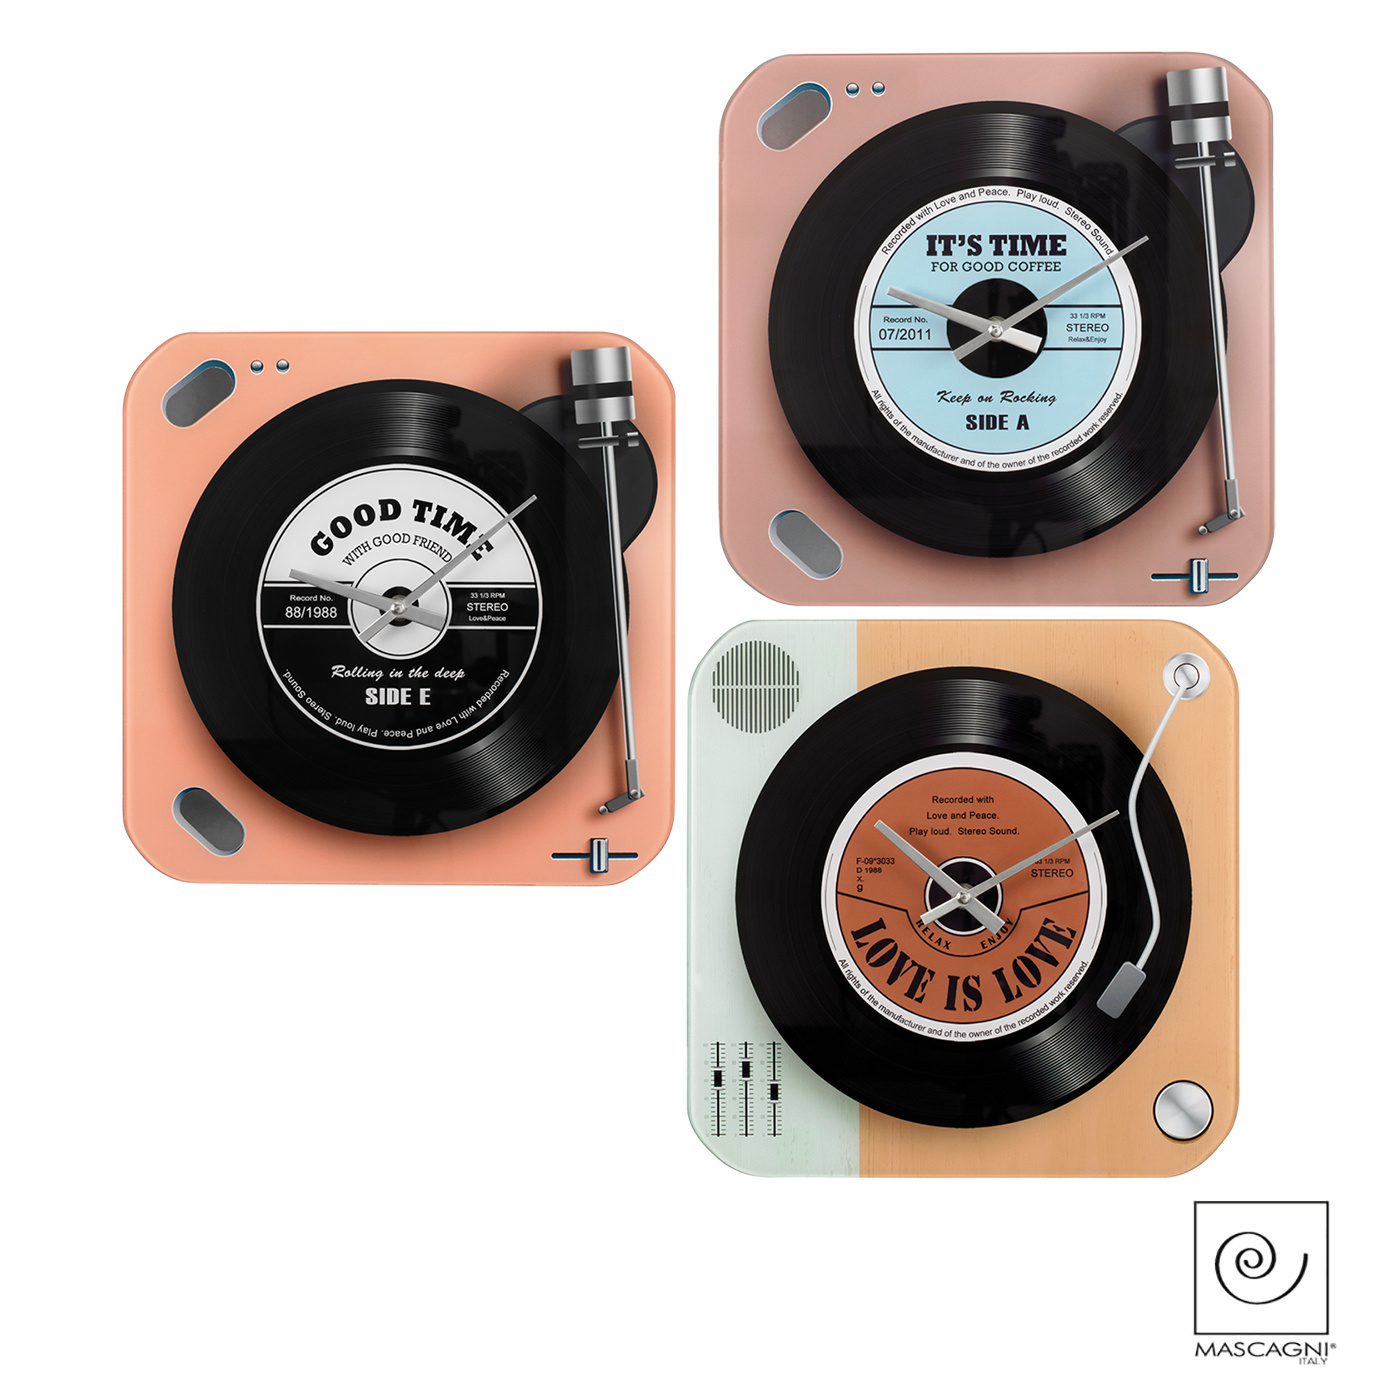 Art Mascagni A1045 WALL CLOCK CM 30X30